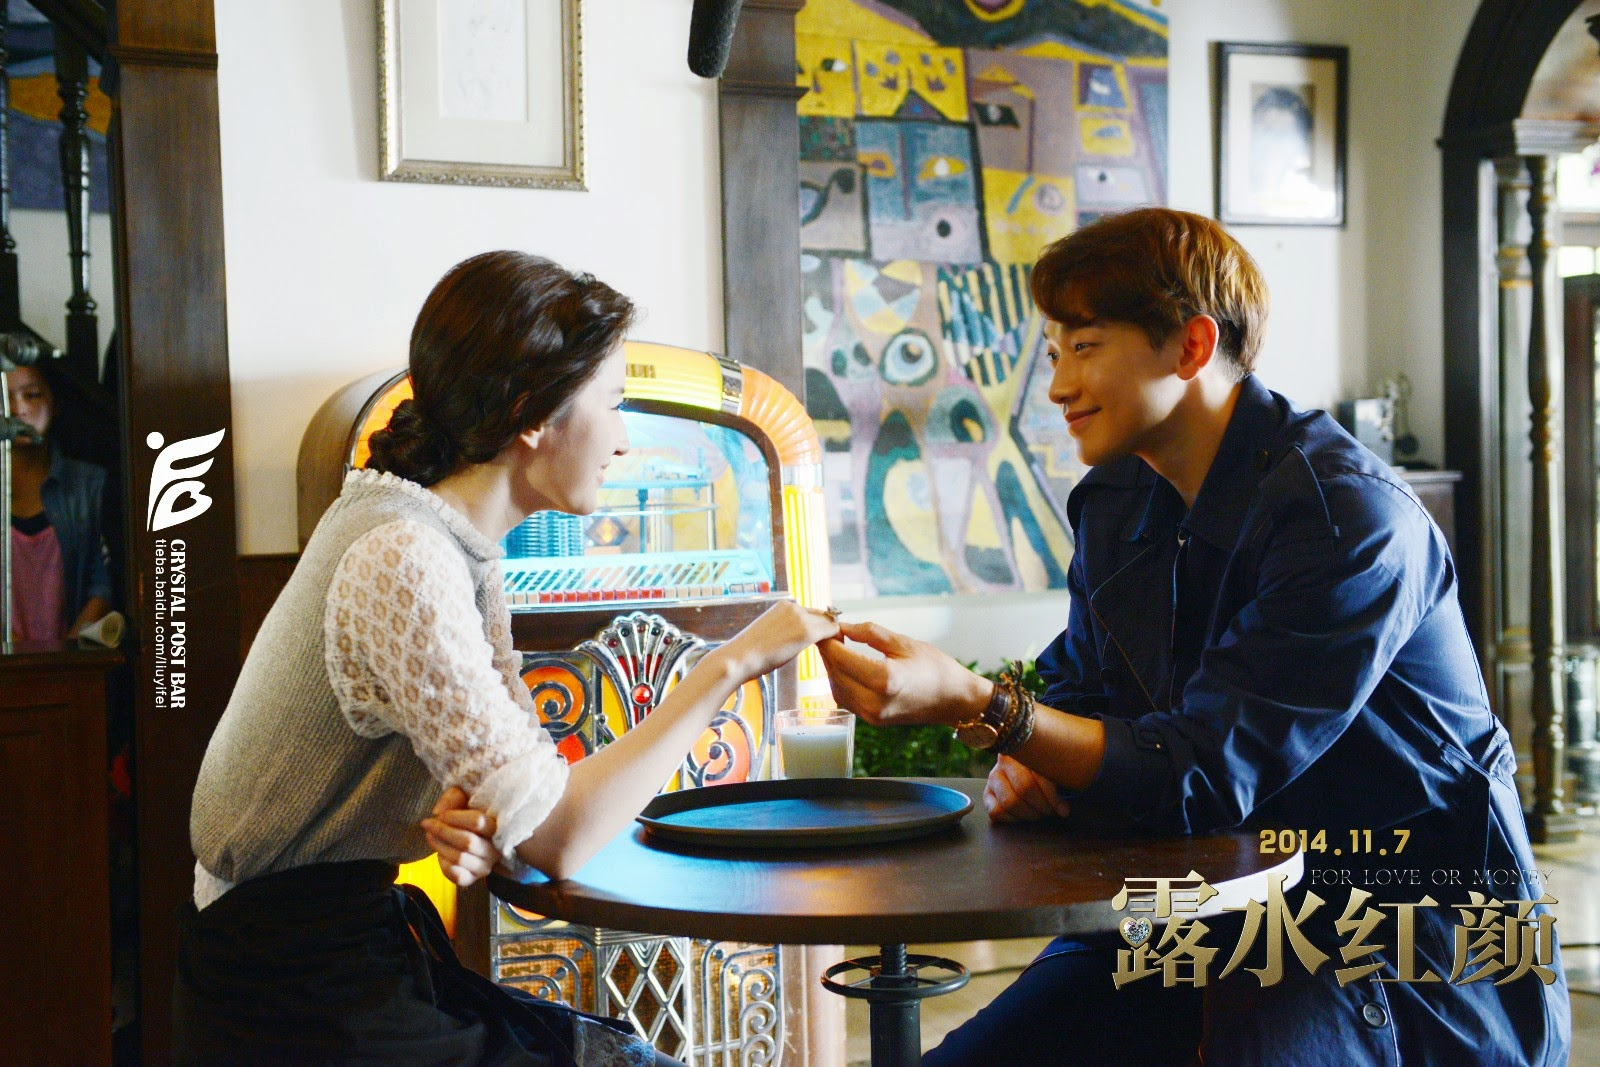 Rain 中国映画 露水紅顔_c0047605_812385.jpg